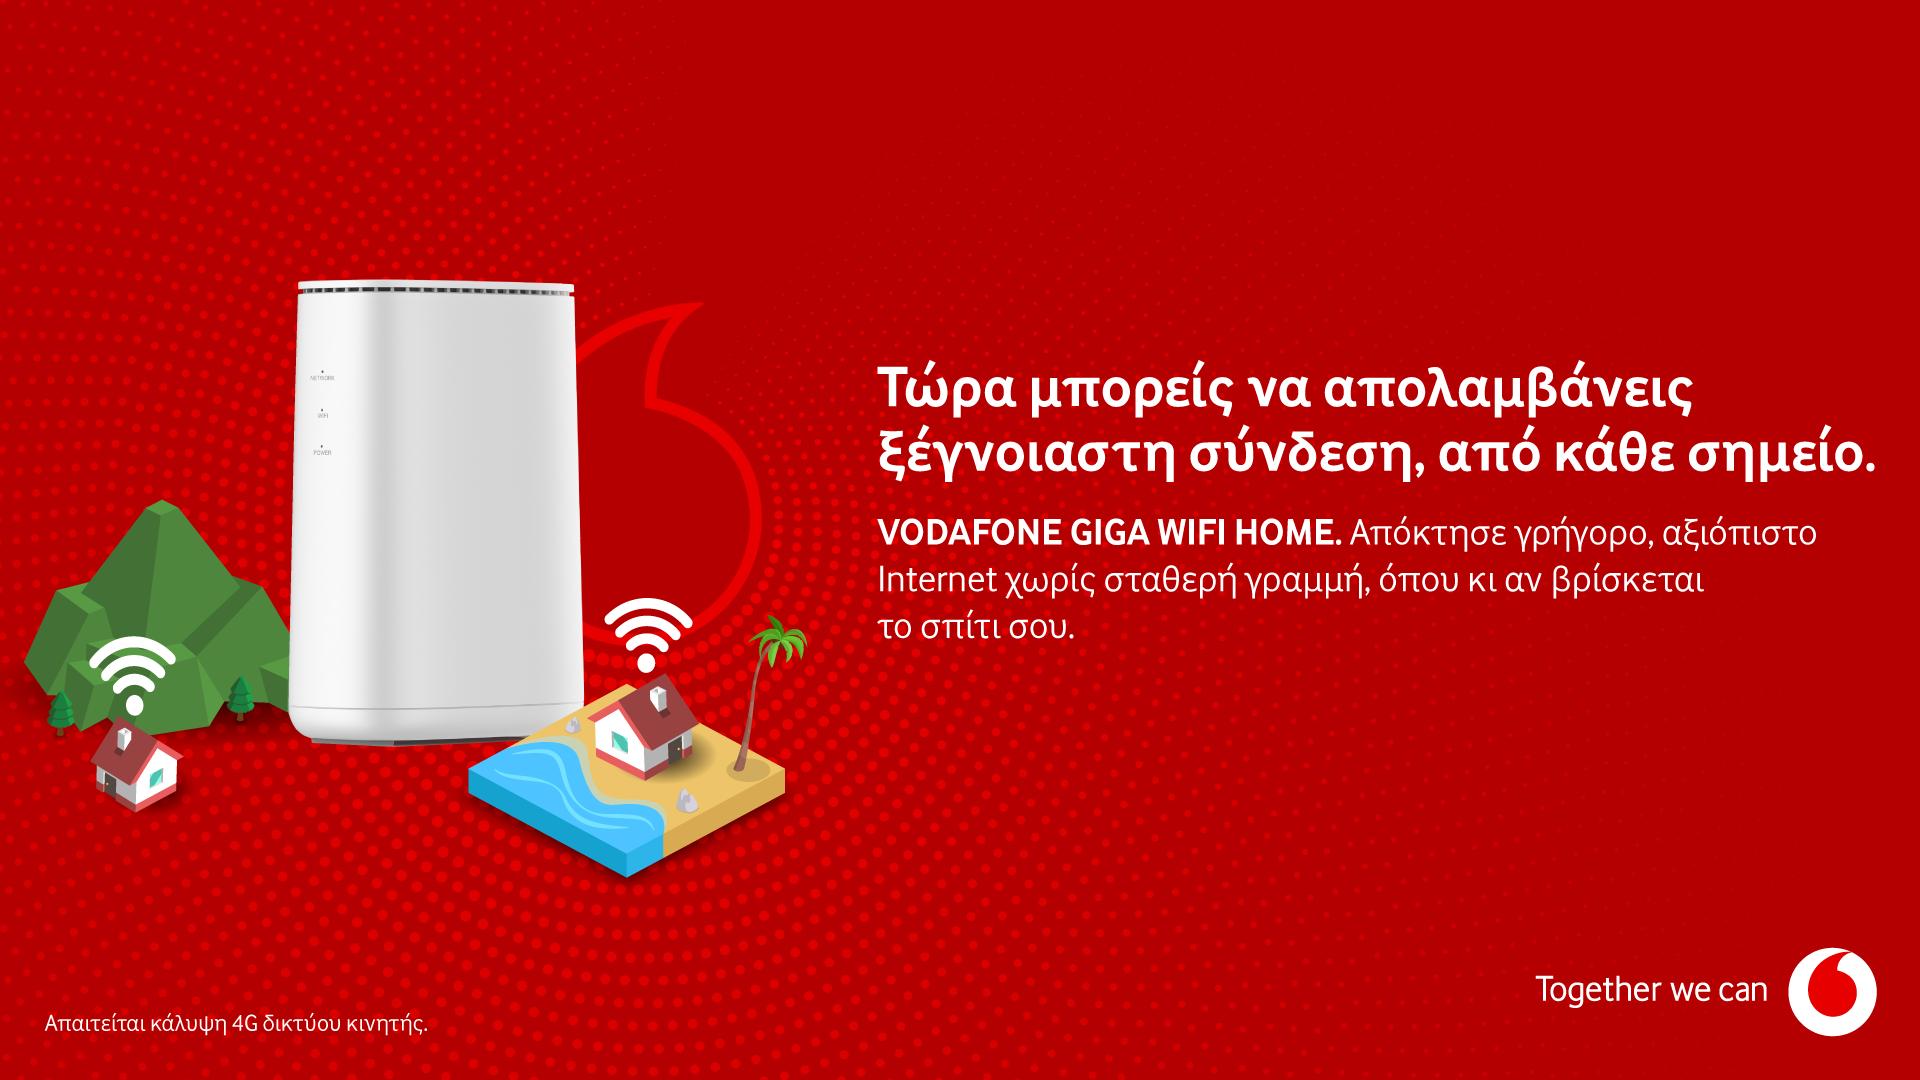 giga wifi home VODAFONE